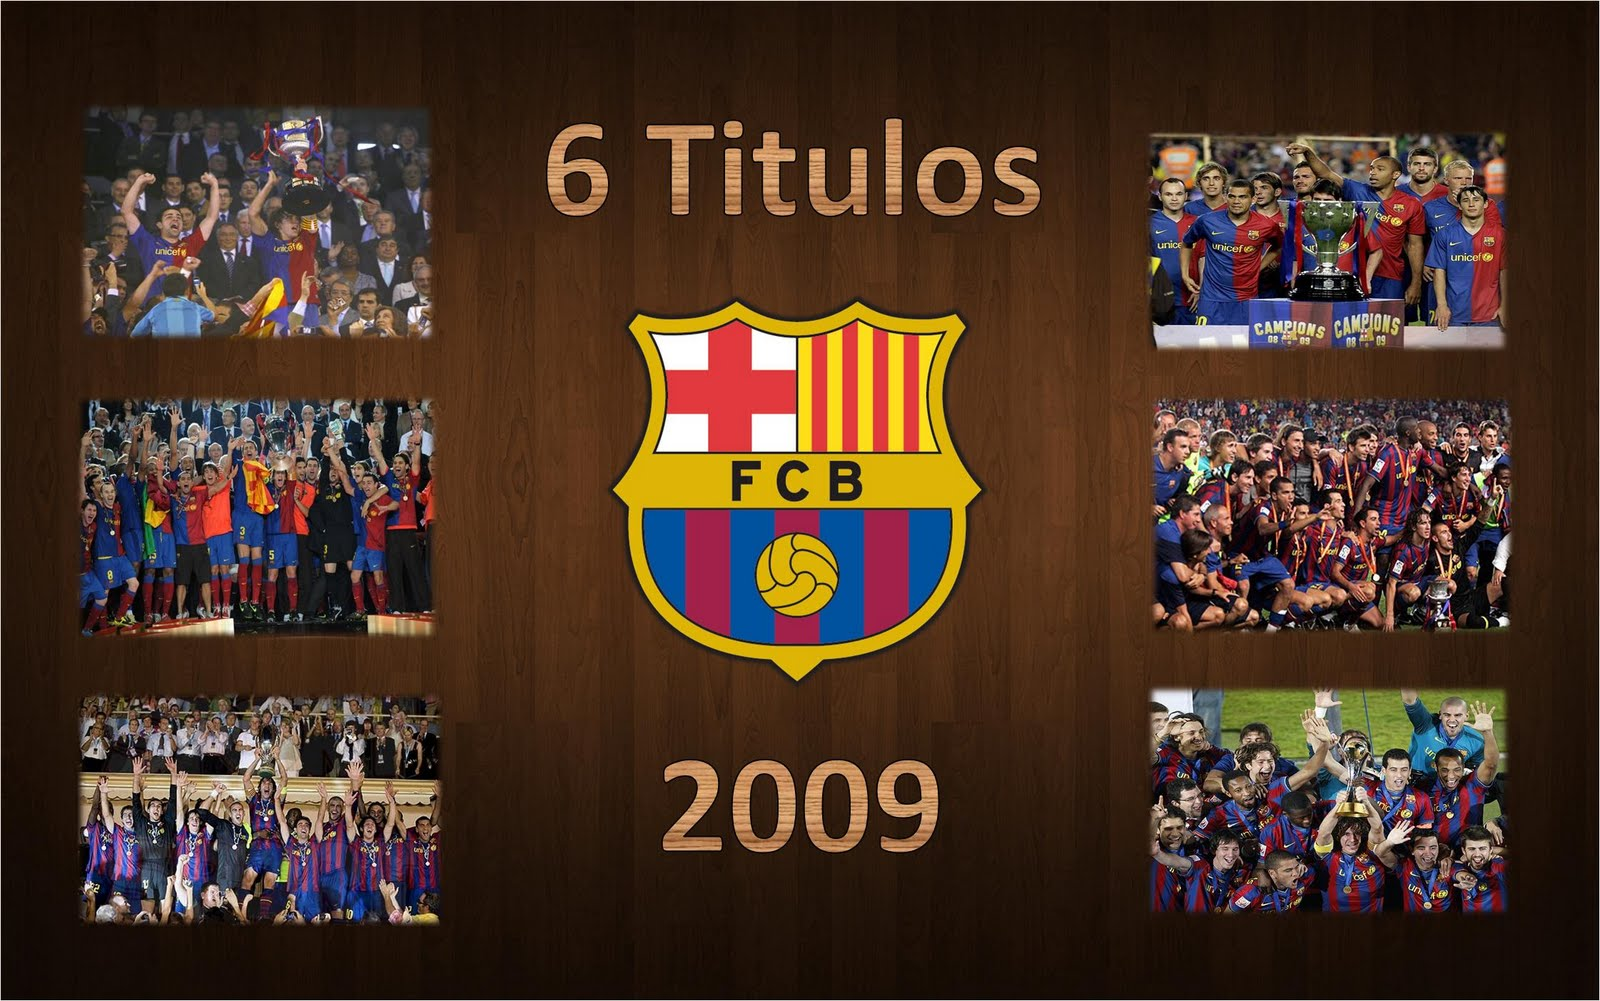 Image Result For Futbol Club Barcelona Titulos